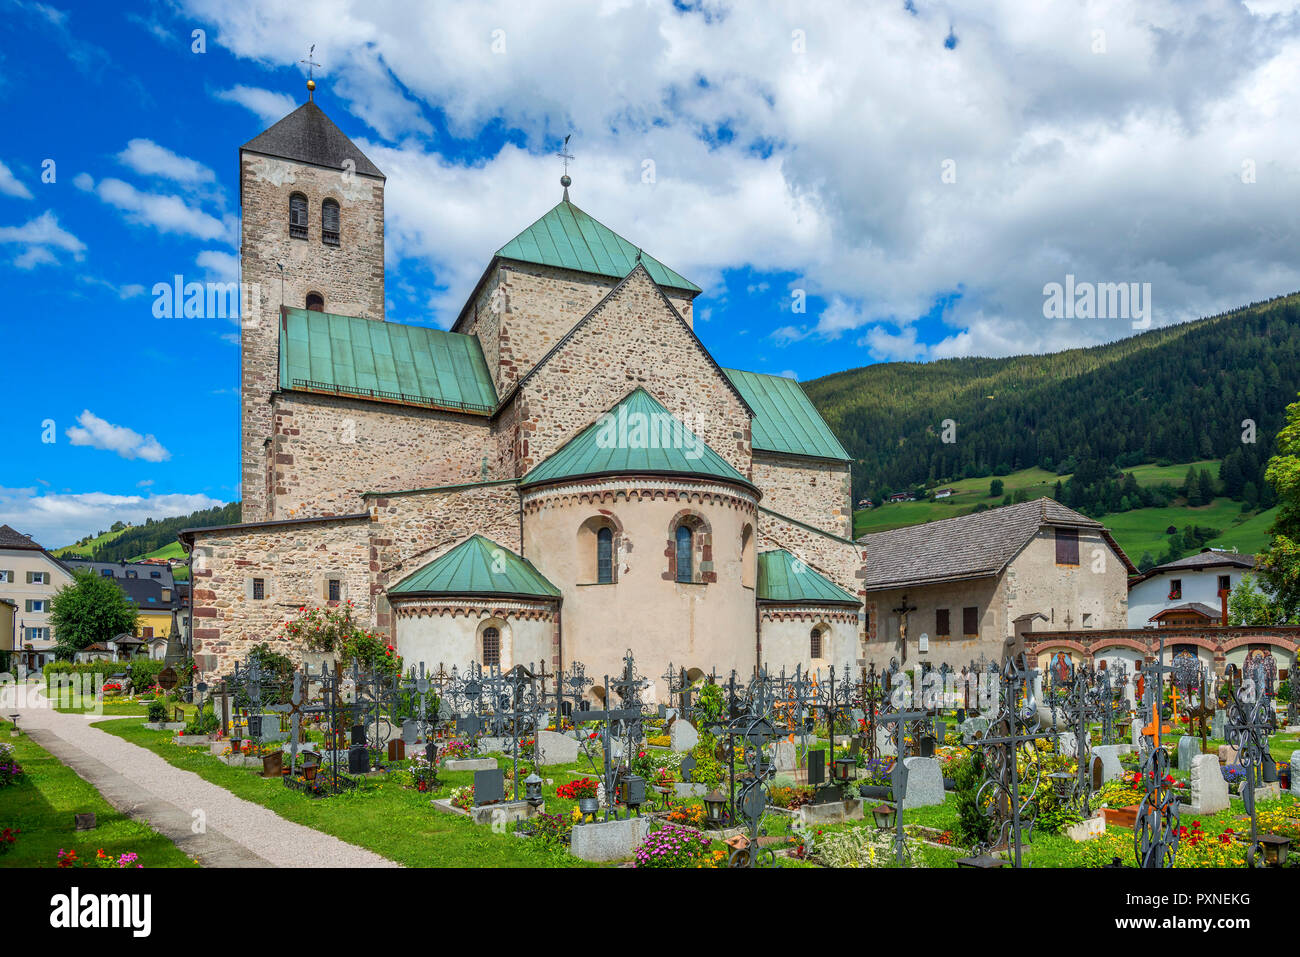 Colligiate church, Innichen, Puster valley, Alto Adige, Italy - Stock Image